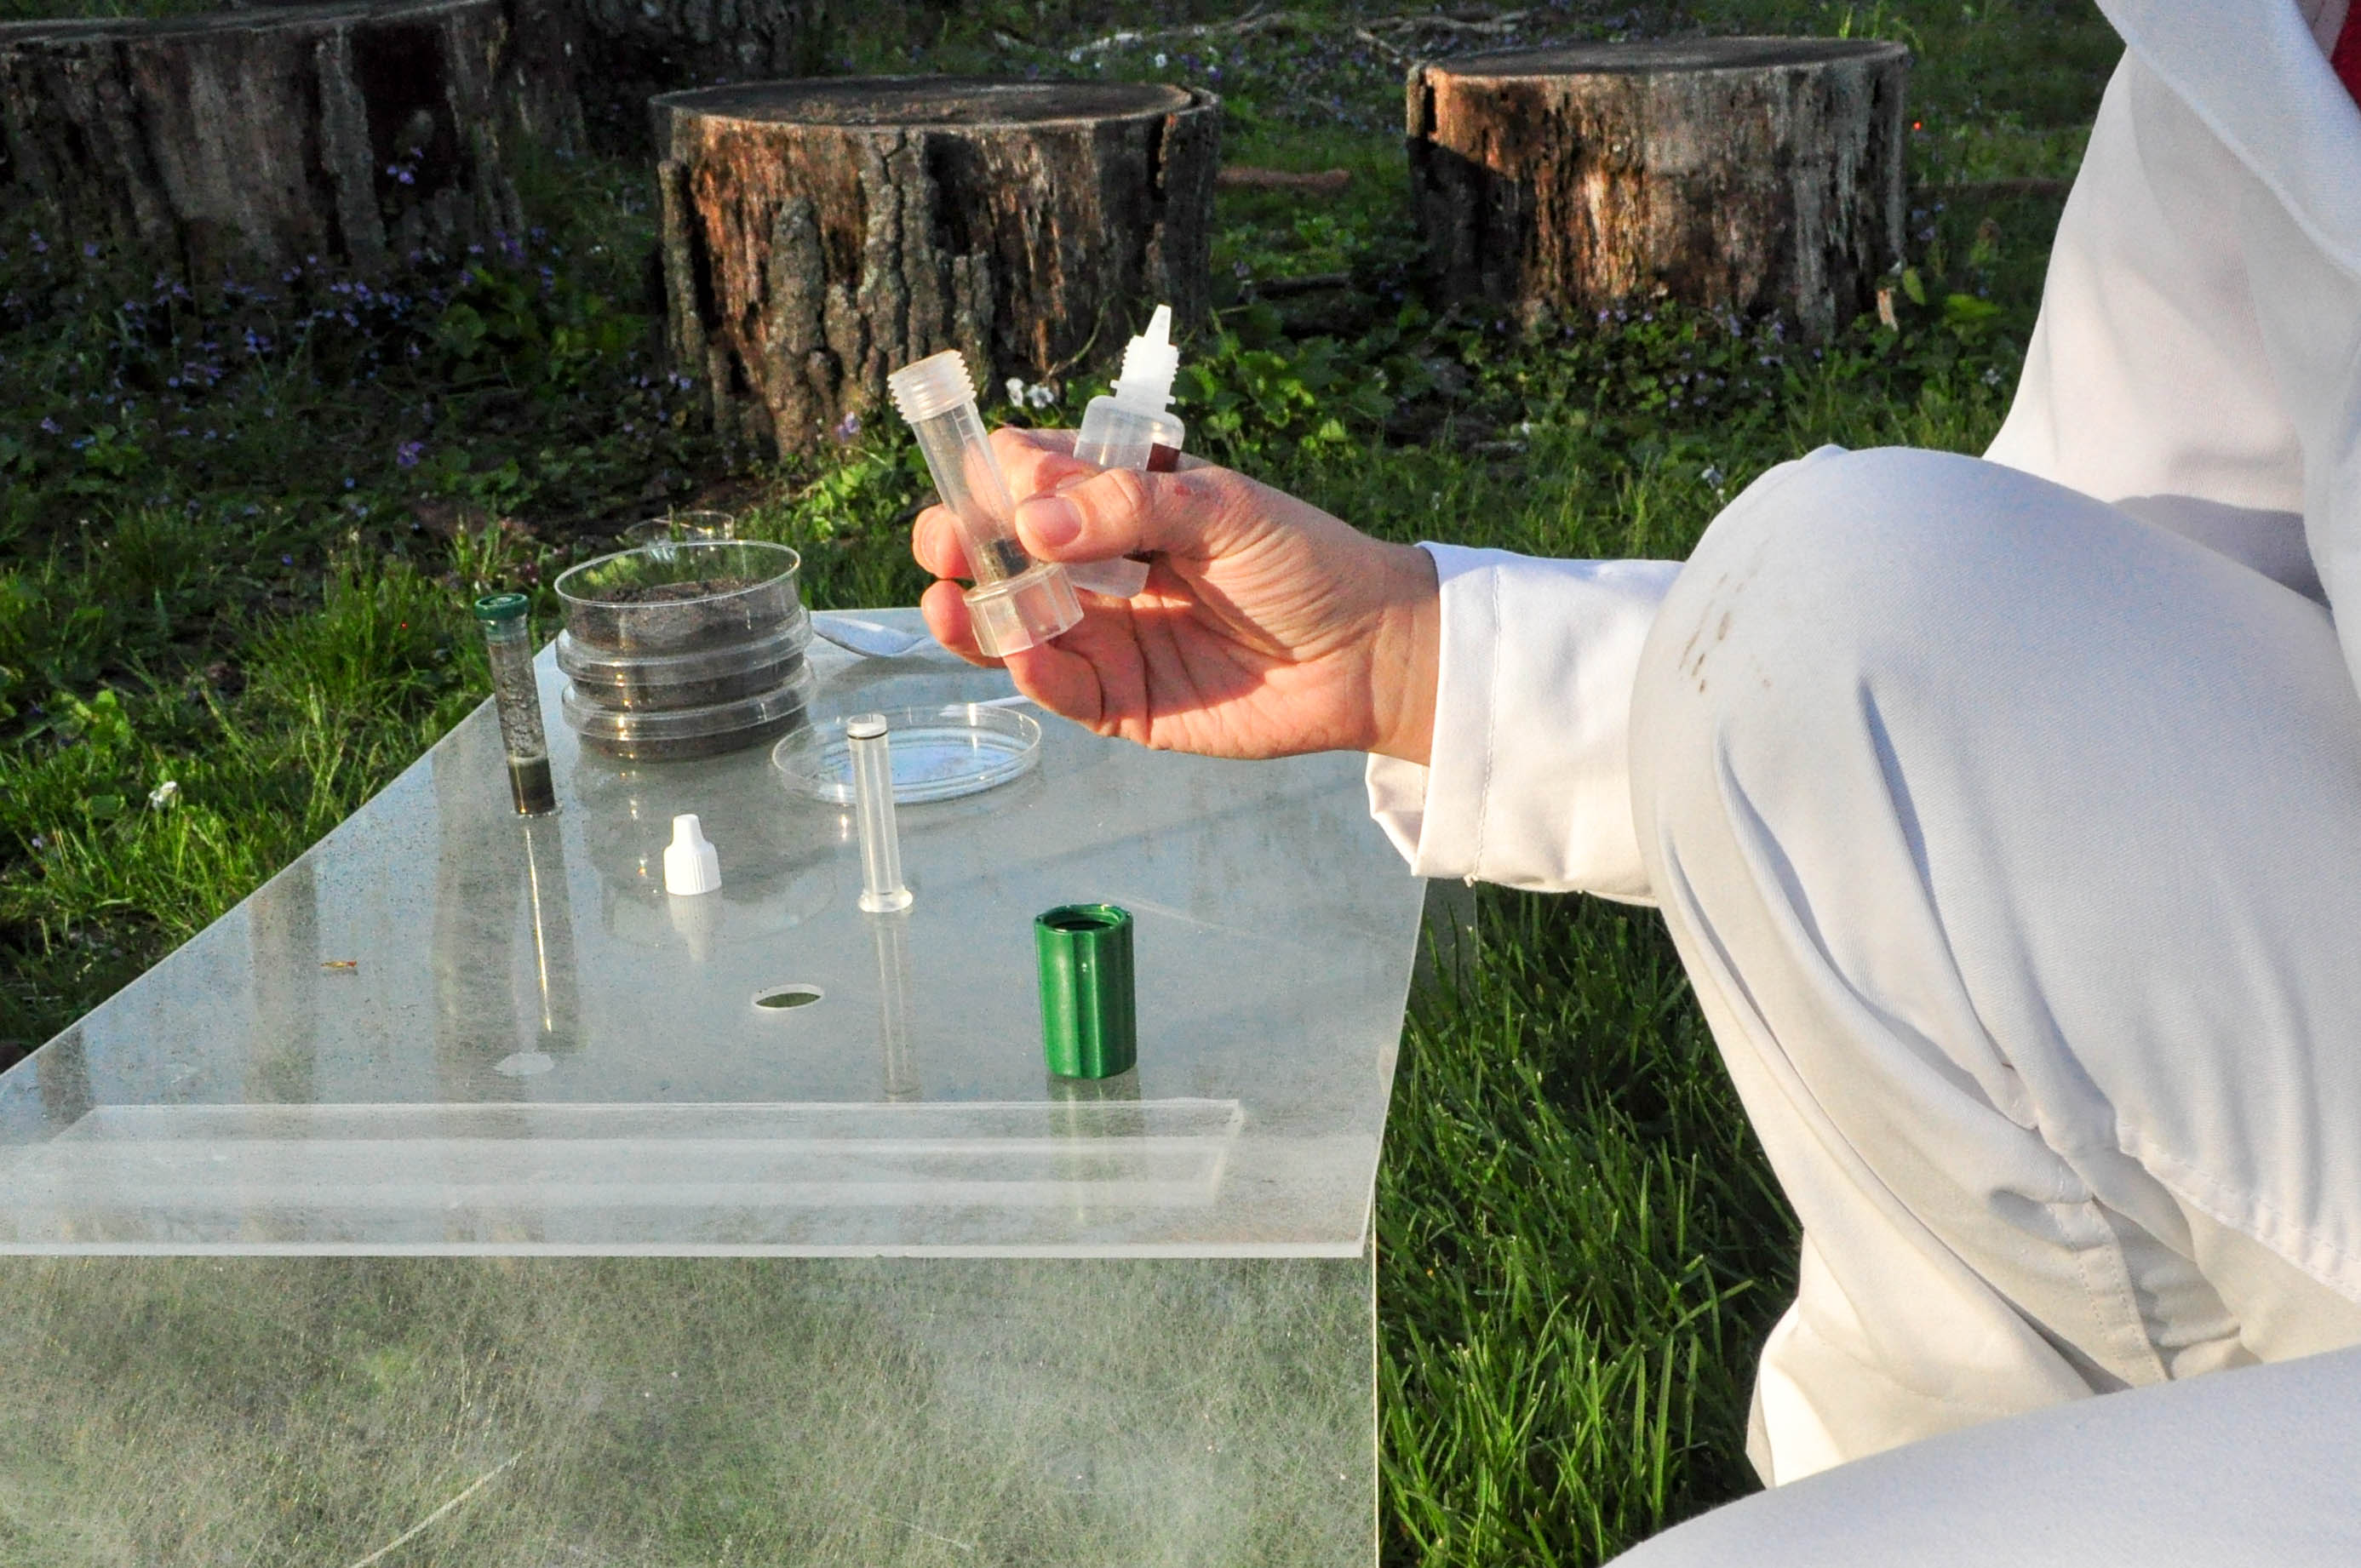 Performing soil tests